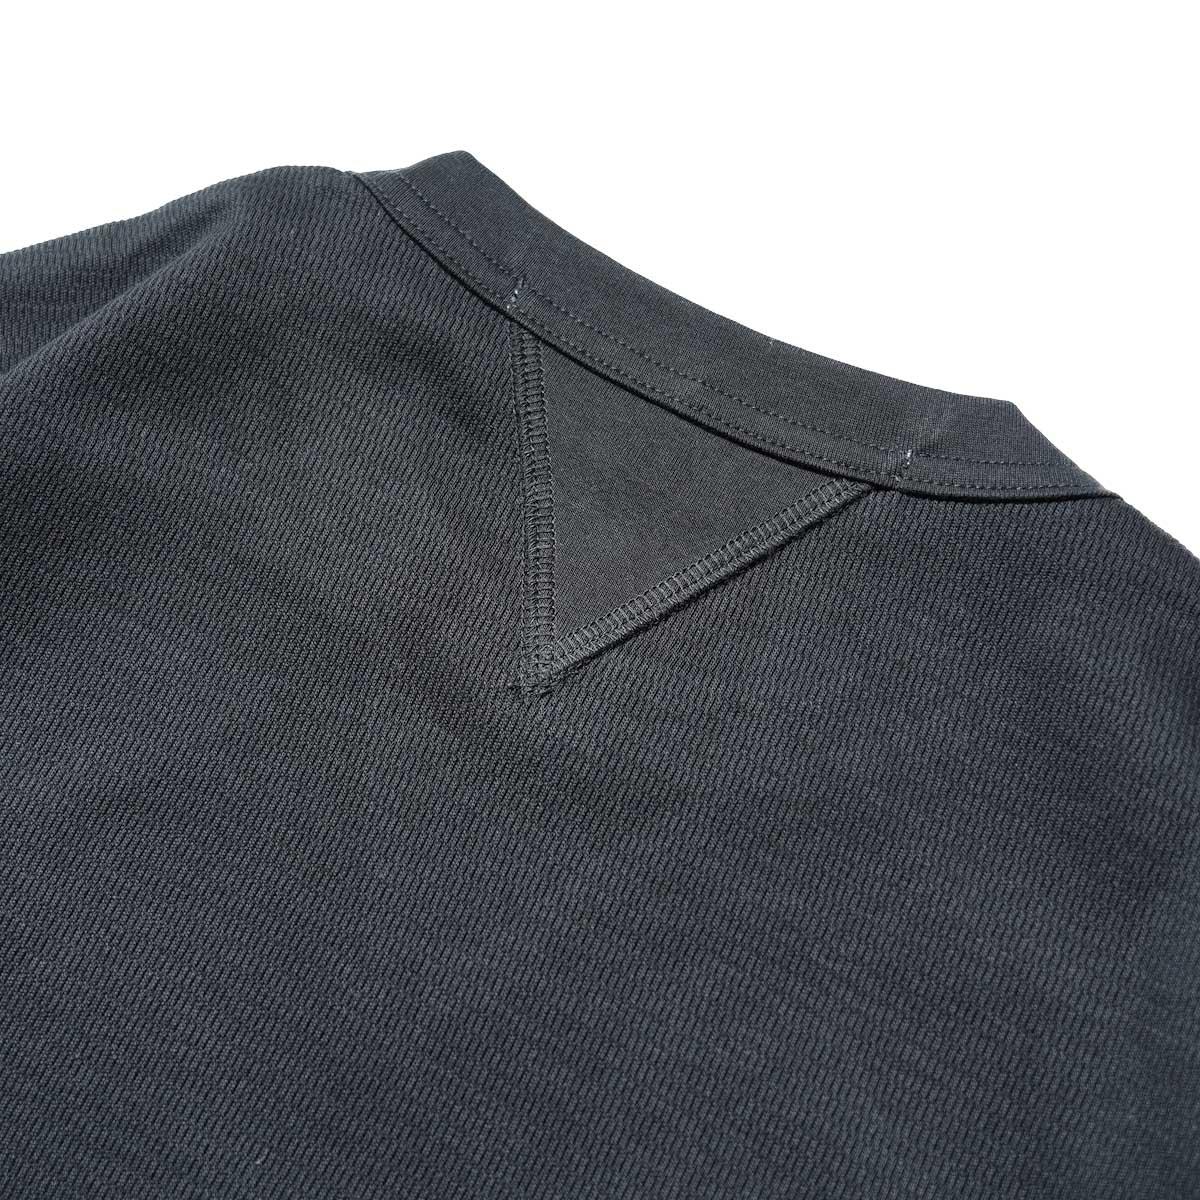 FUTURE PRIMITIVE / FP THERMAL V T-SHIRT (Black)背面ガセット